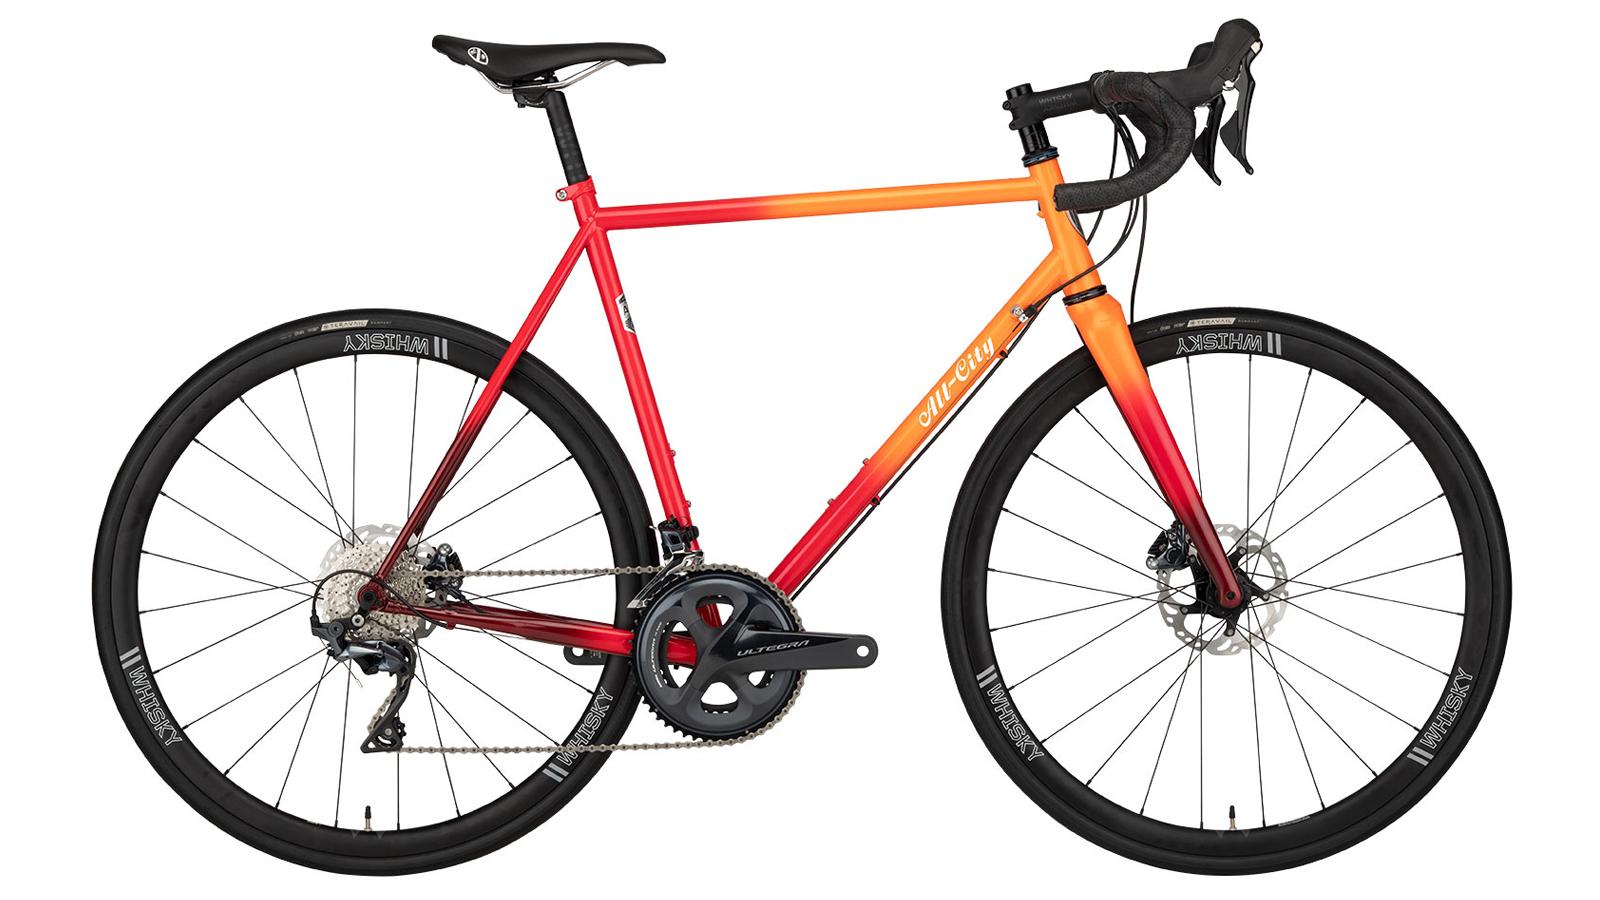 Best steel bikes: All-City